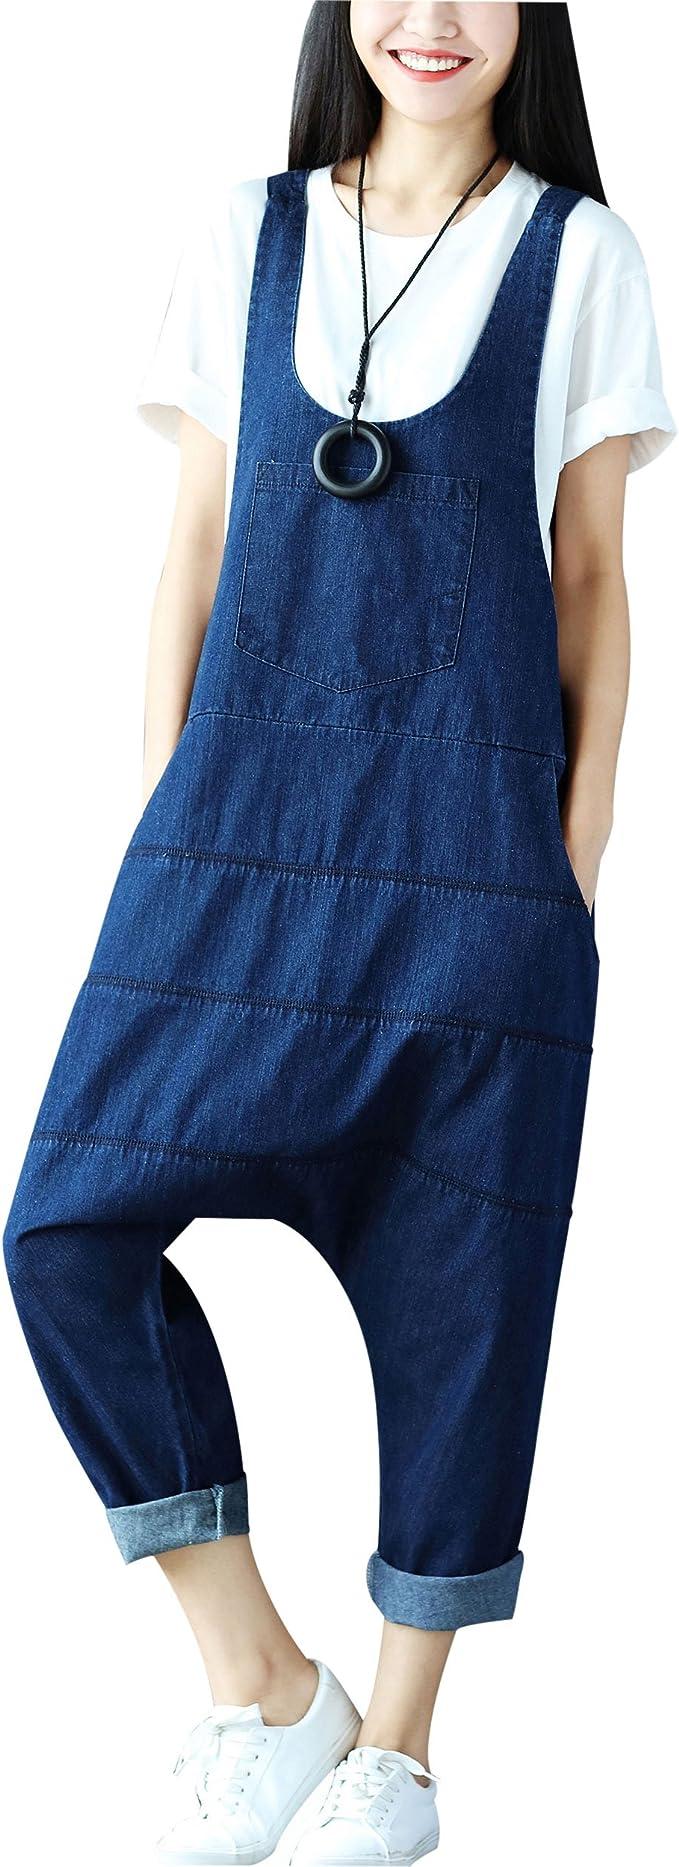 2017 Retro Women Casual Denim Dungaree Jumpsuit Overalls Jeans Harem Trousers